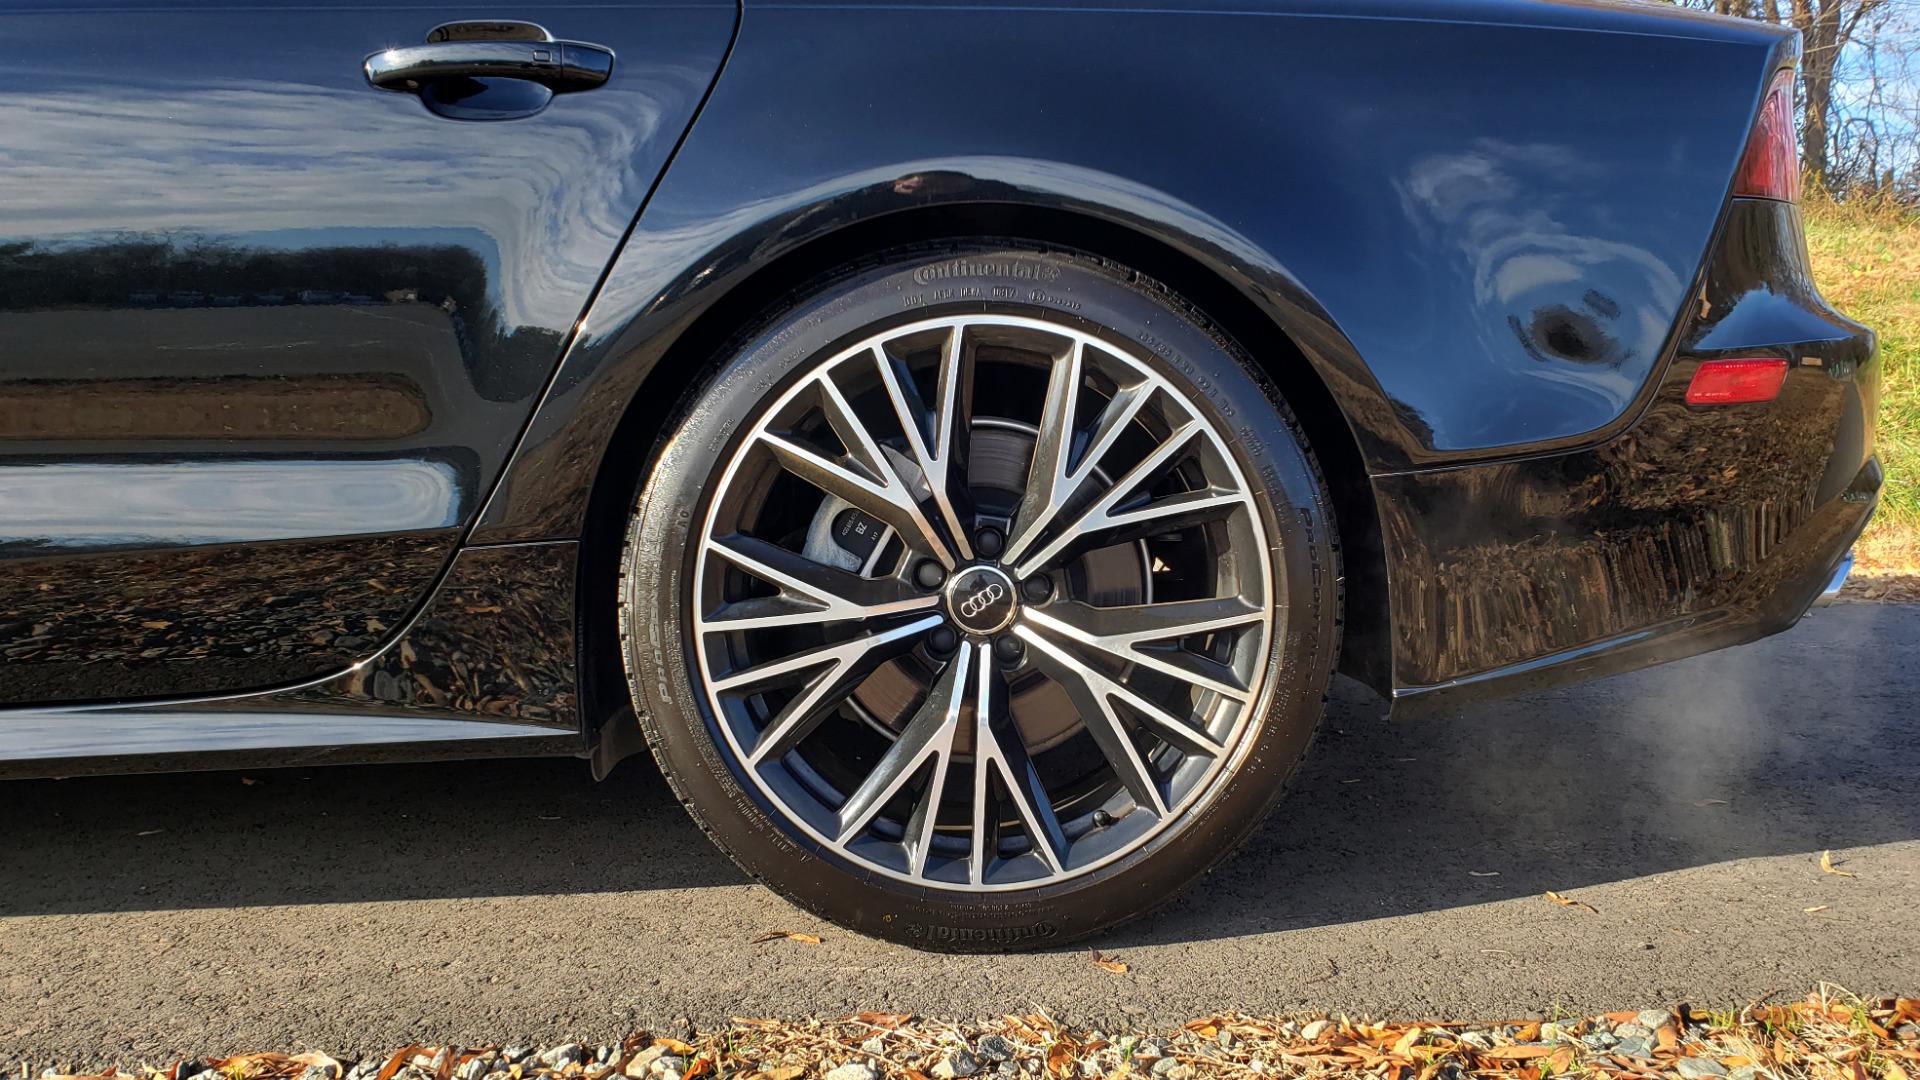 Used 2017 Audi A7 PRESTIGE / DRVR ASST / S-LINE SPORT / NAV / REARVIEW for sale Sold at Formula Imports in Charlotte NC 28227 7